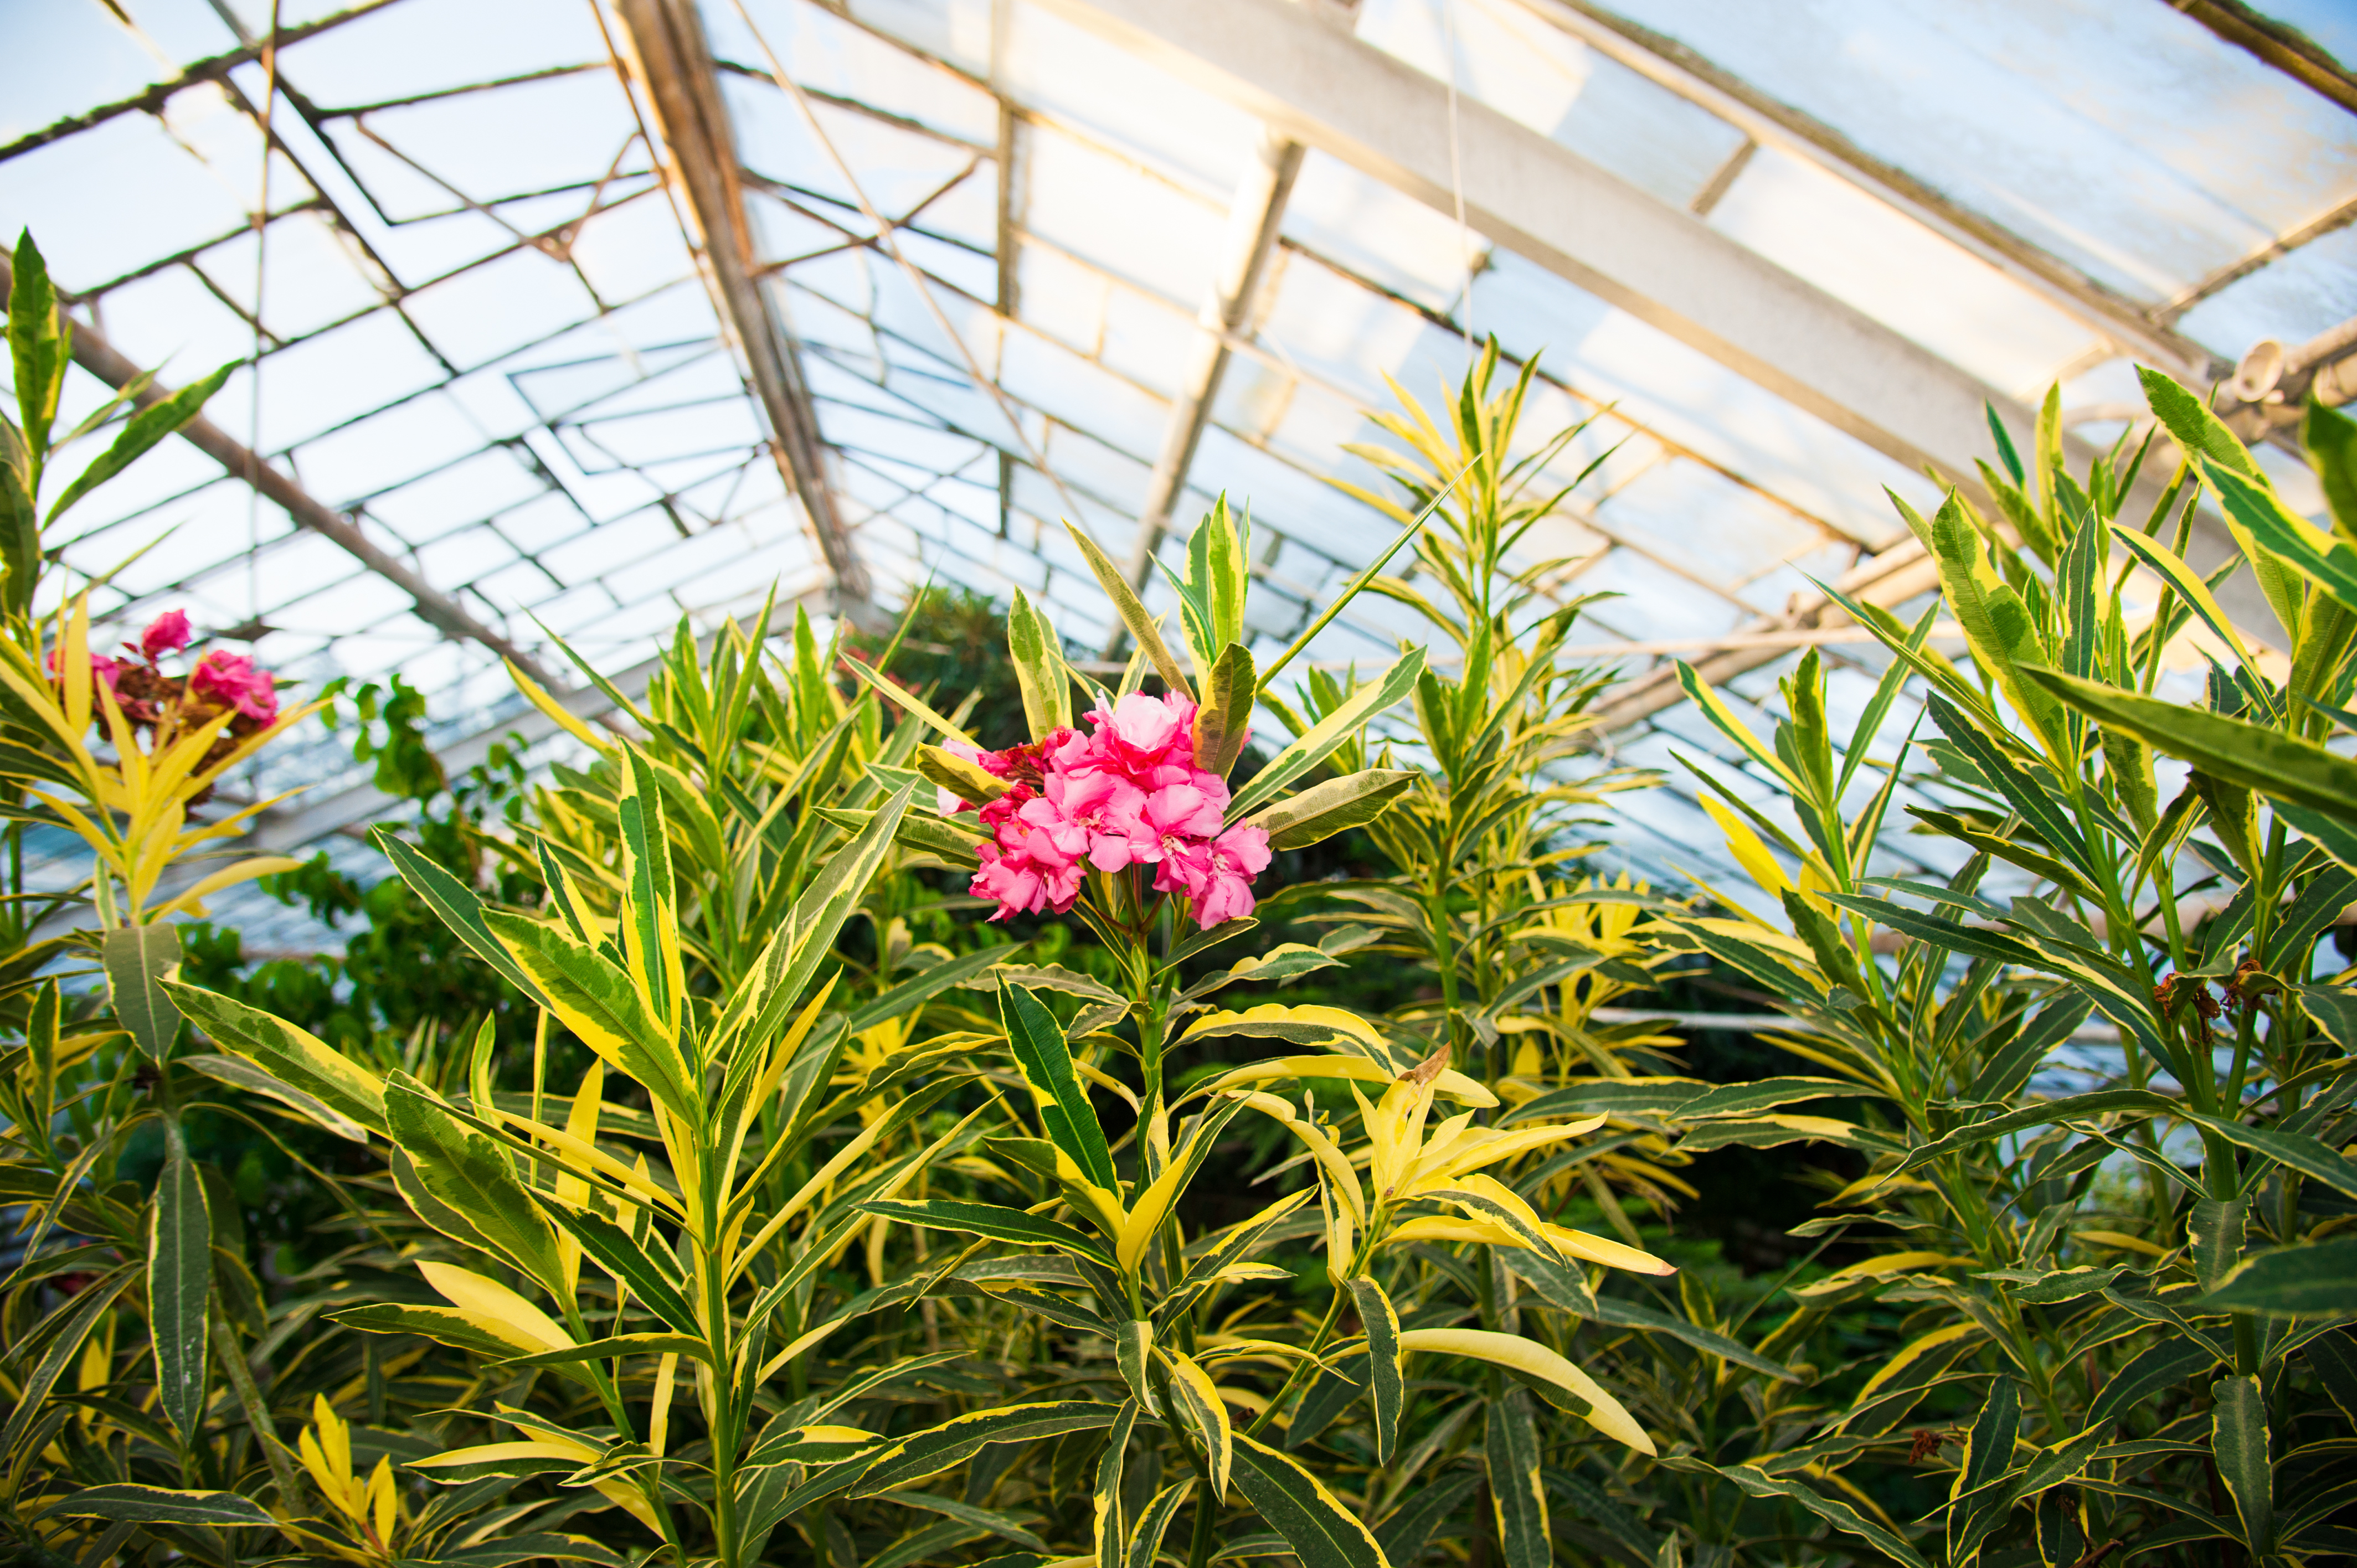 Wholesale tropical plant nursery sorrento fl shane for Cheap garden plants